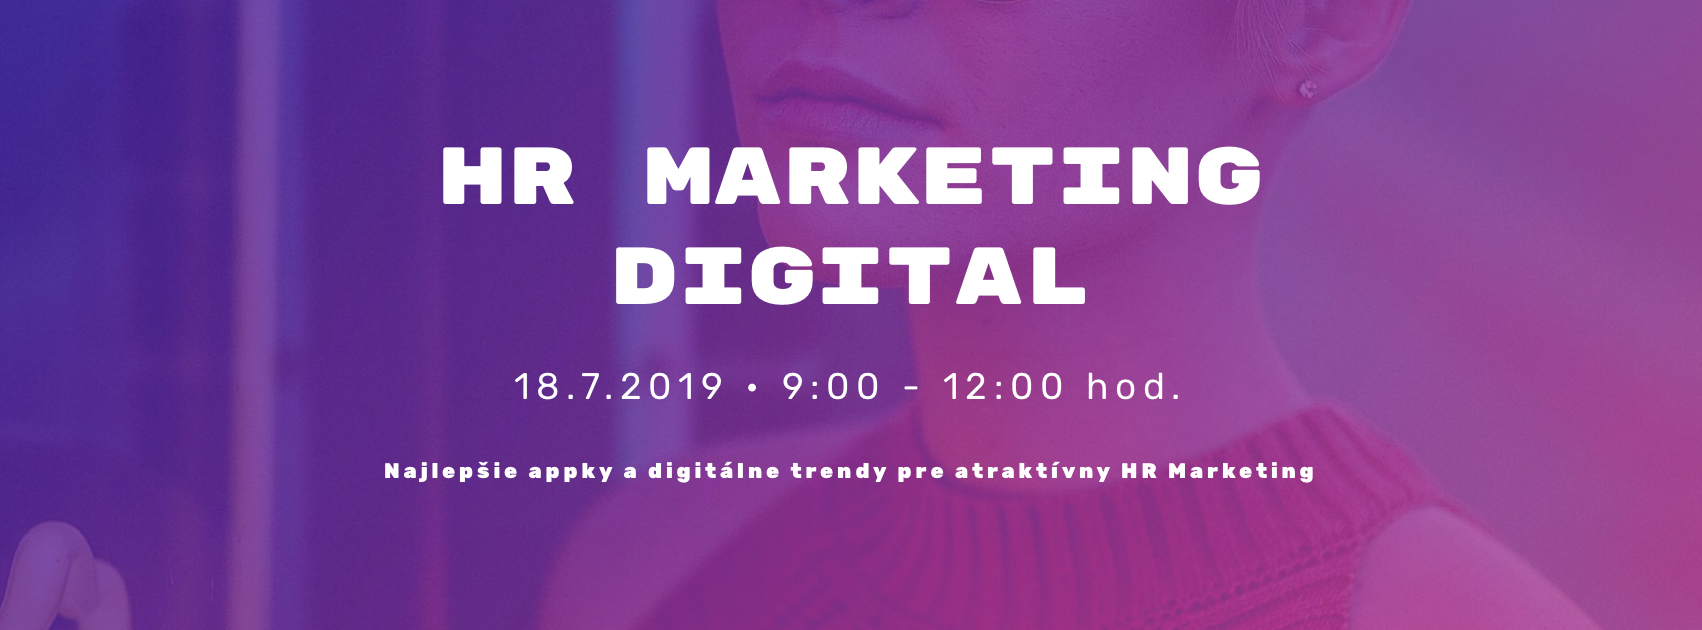 HR-Marketing-Facebook-Cover.PNG